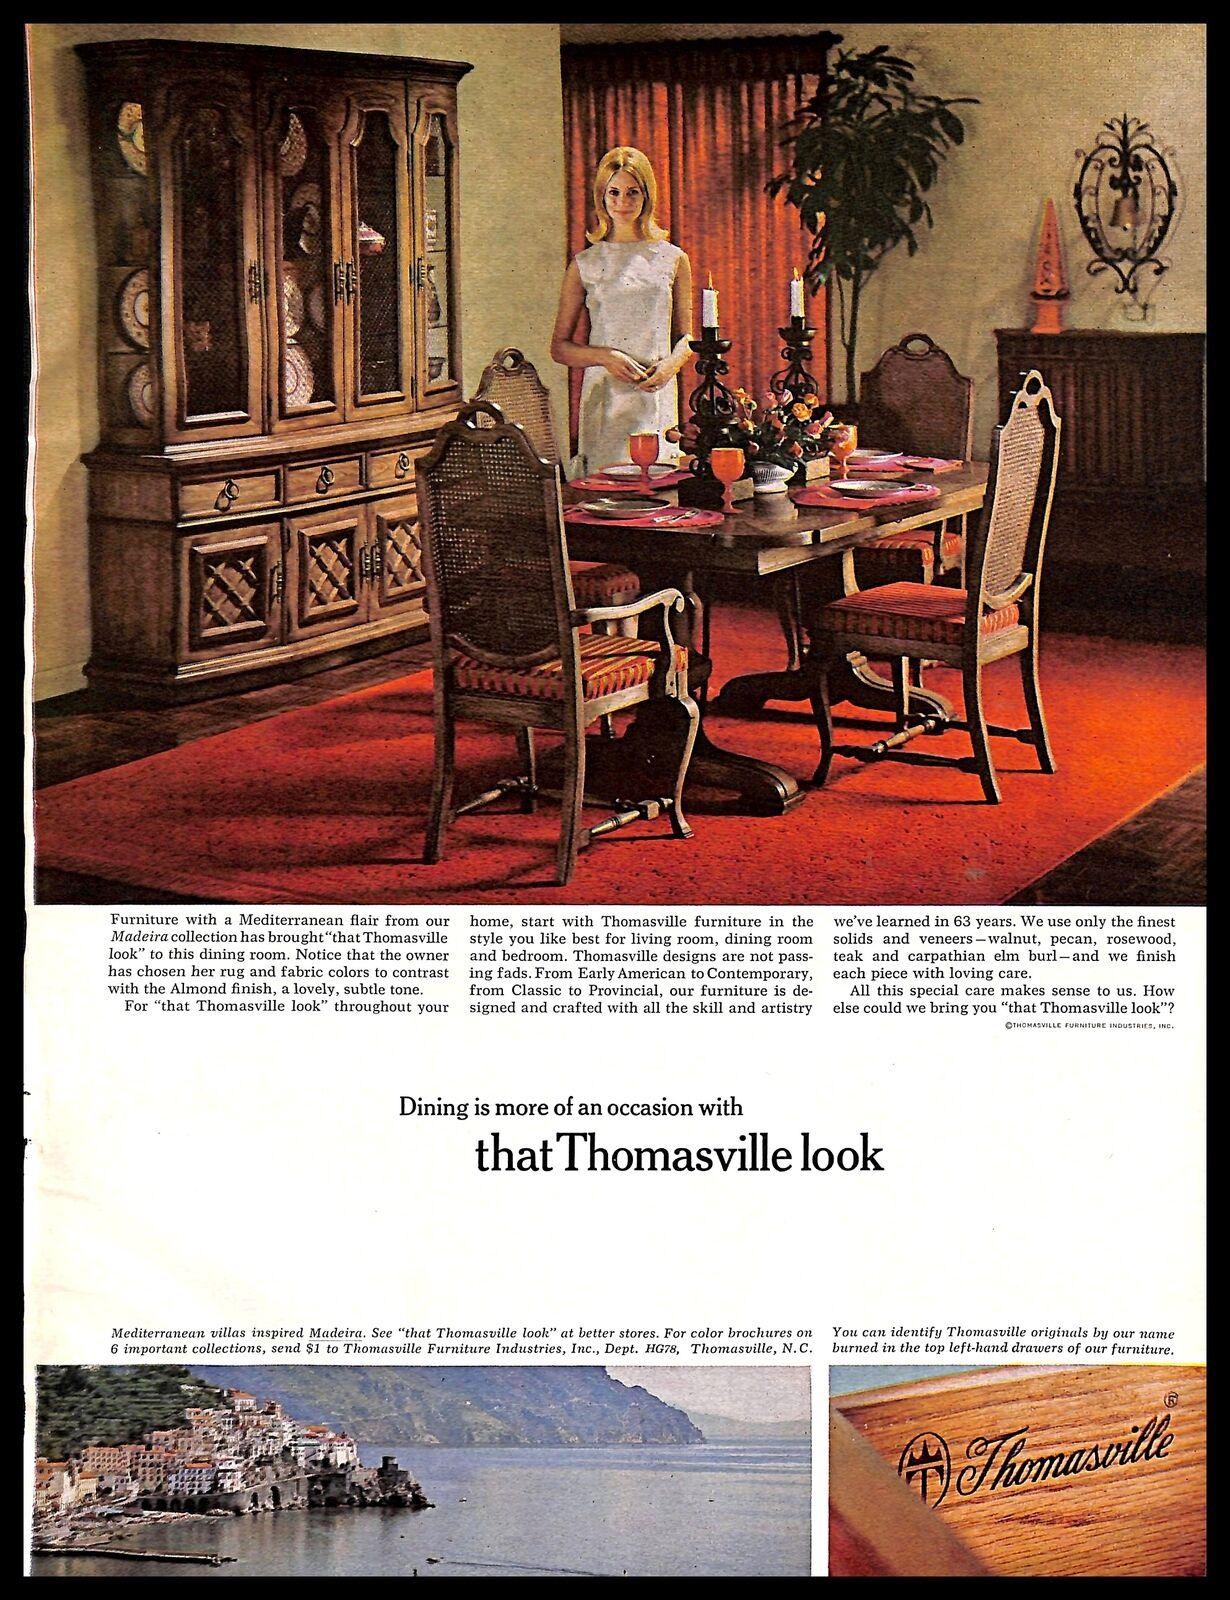 1967 Thomasville Furniture Vintage PRINT AD Mediterranean Style Home Decor 1960s